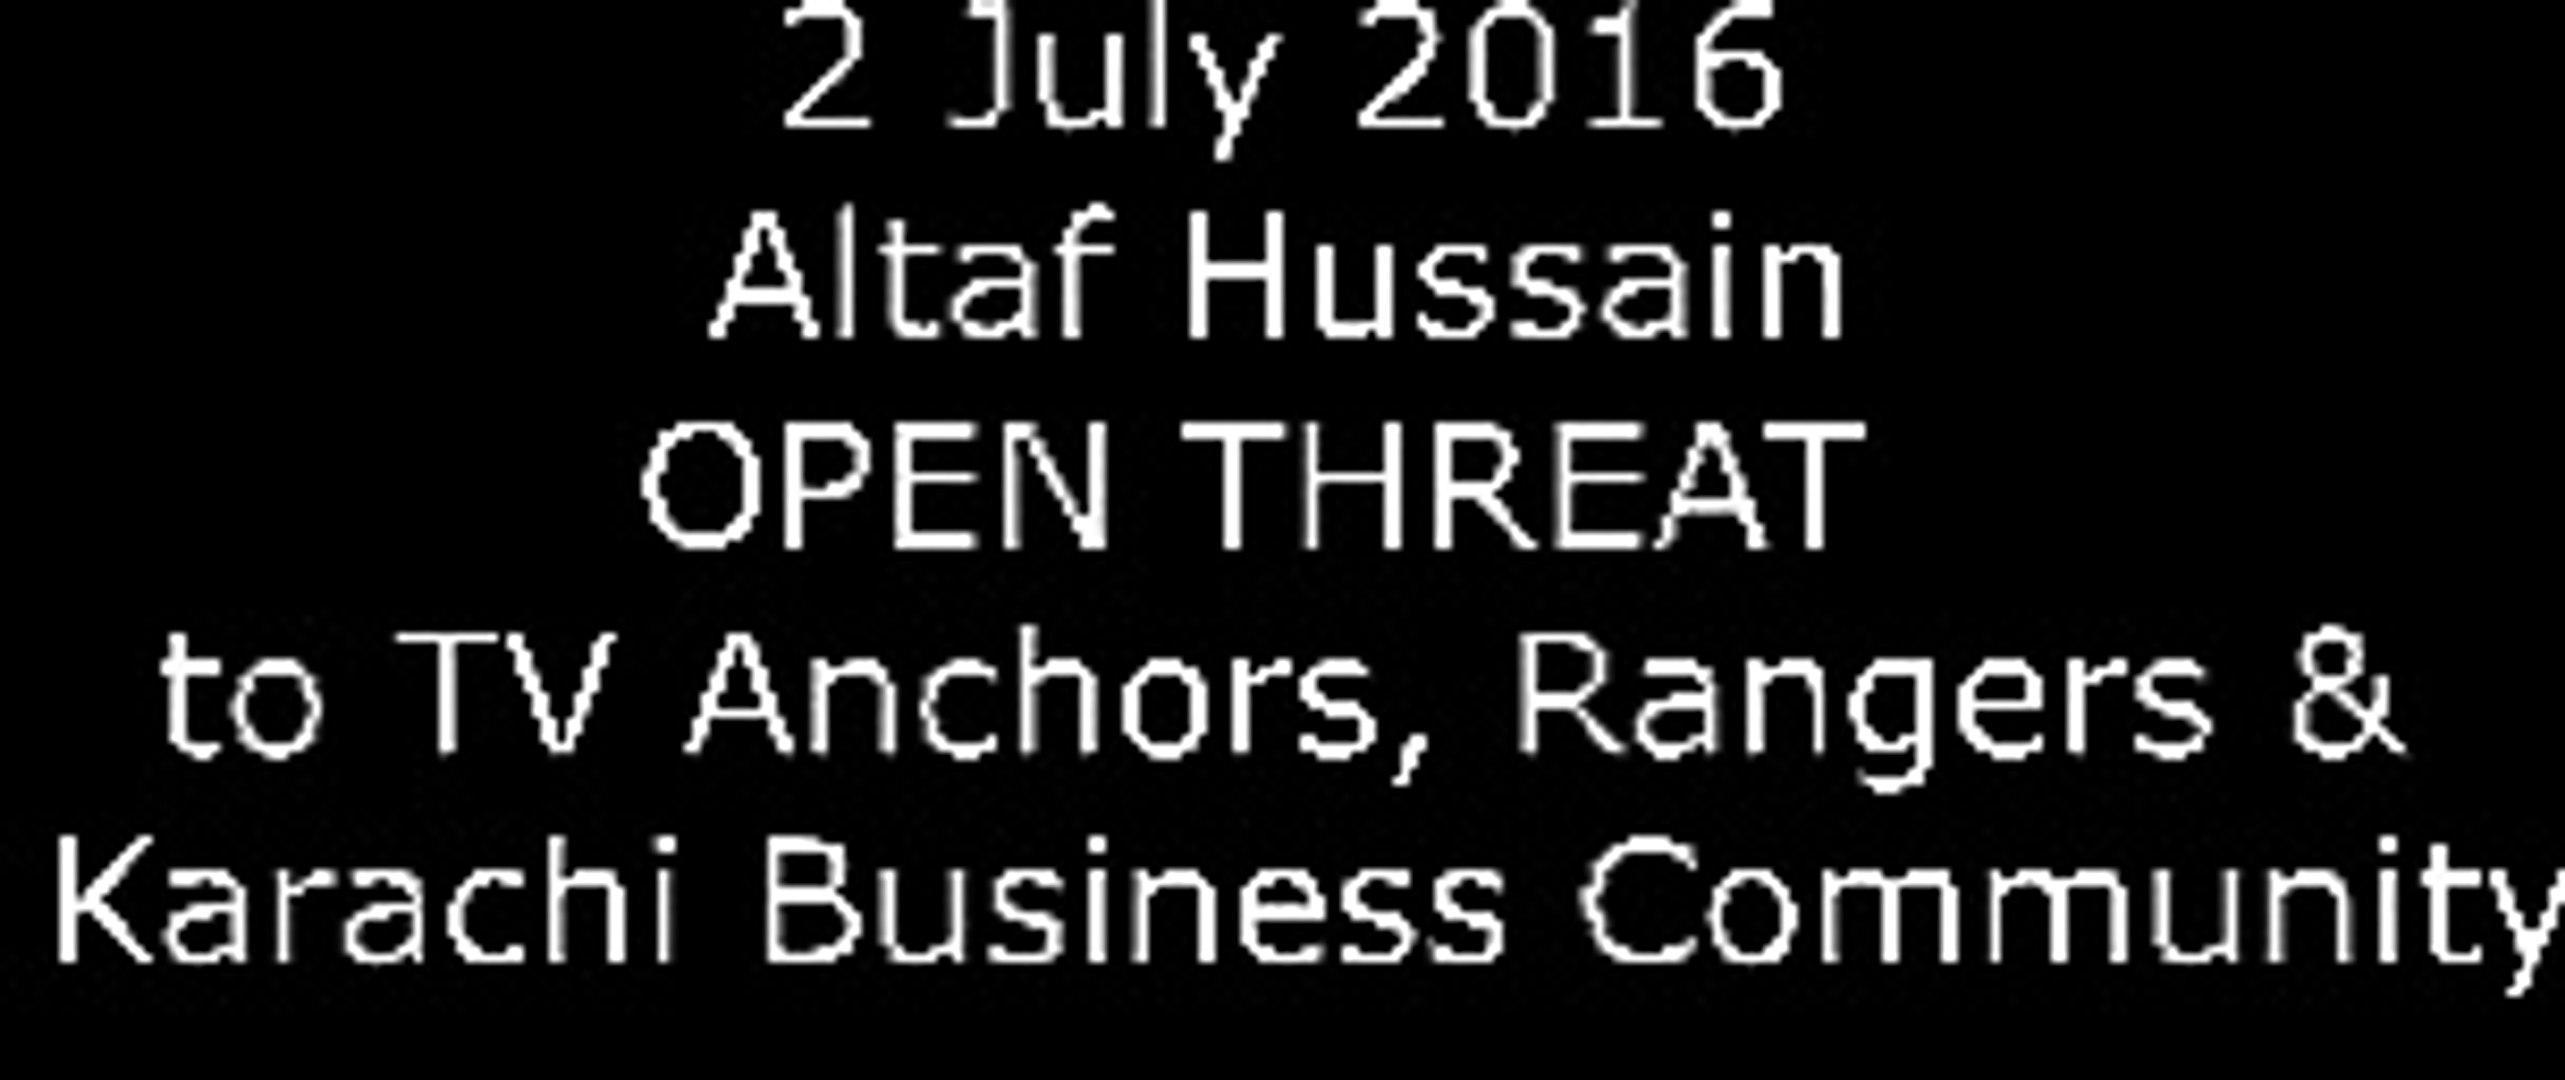 NEW Speech:- Altaf Hussain open Threat to TV Anchors and Karachi Business Community